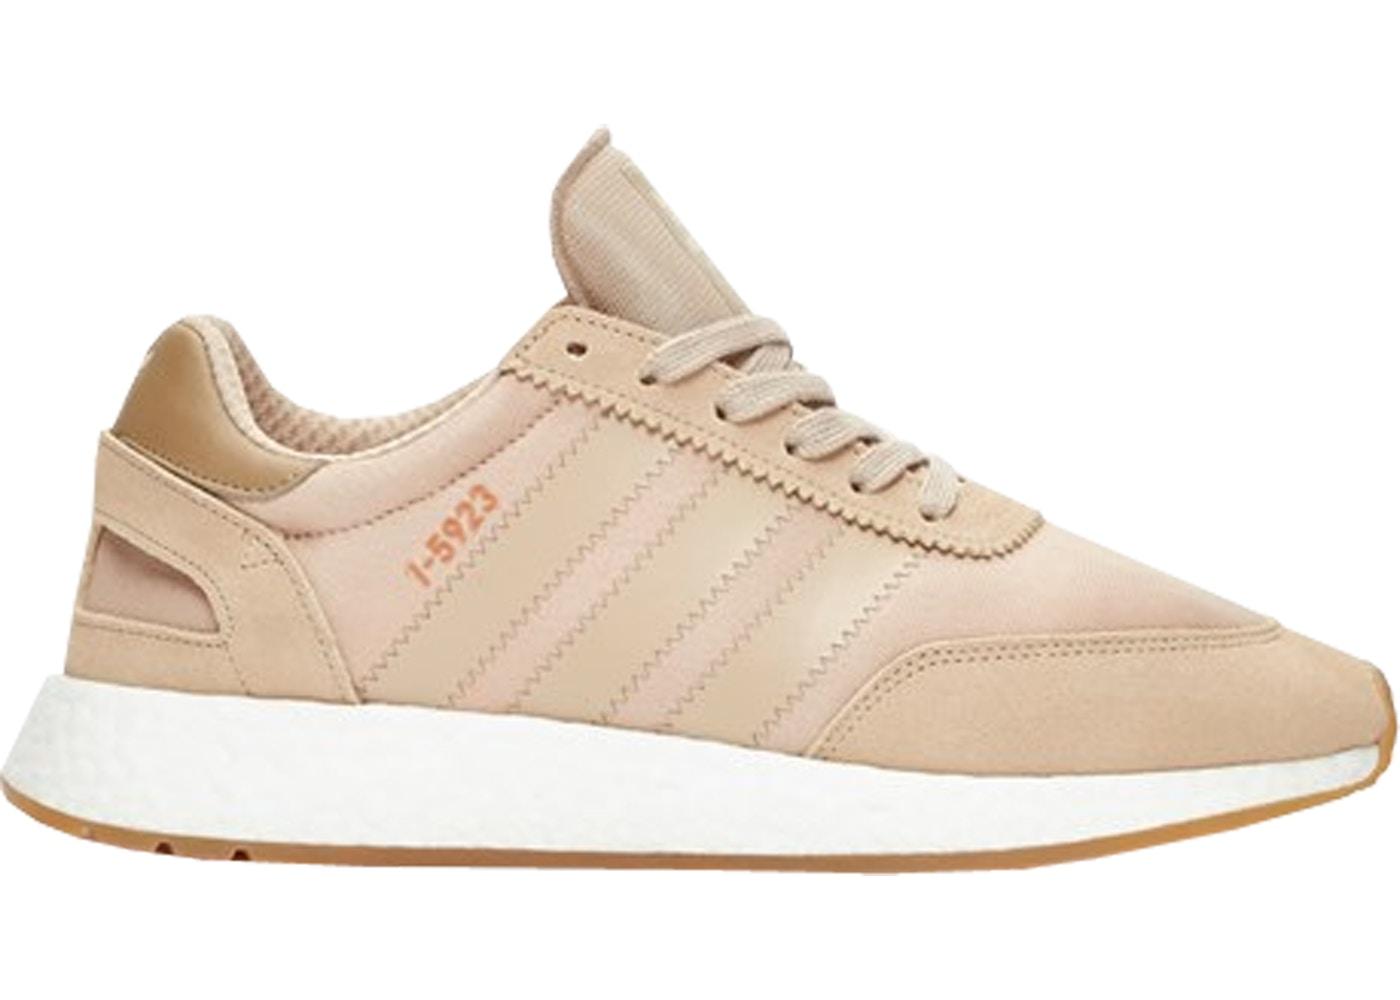 4c241f3bb71 adidas I-5923 Sneakersnstuff St Pale Nude